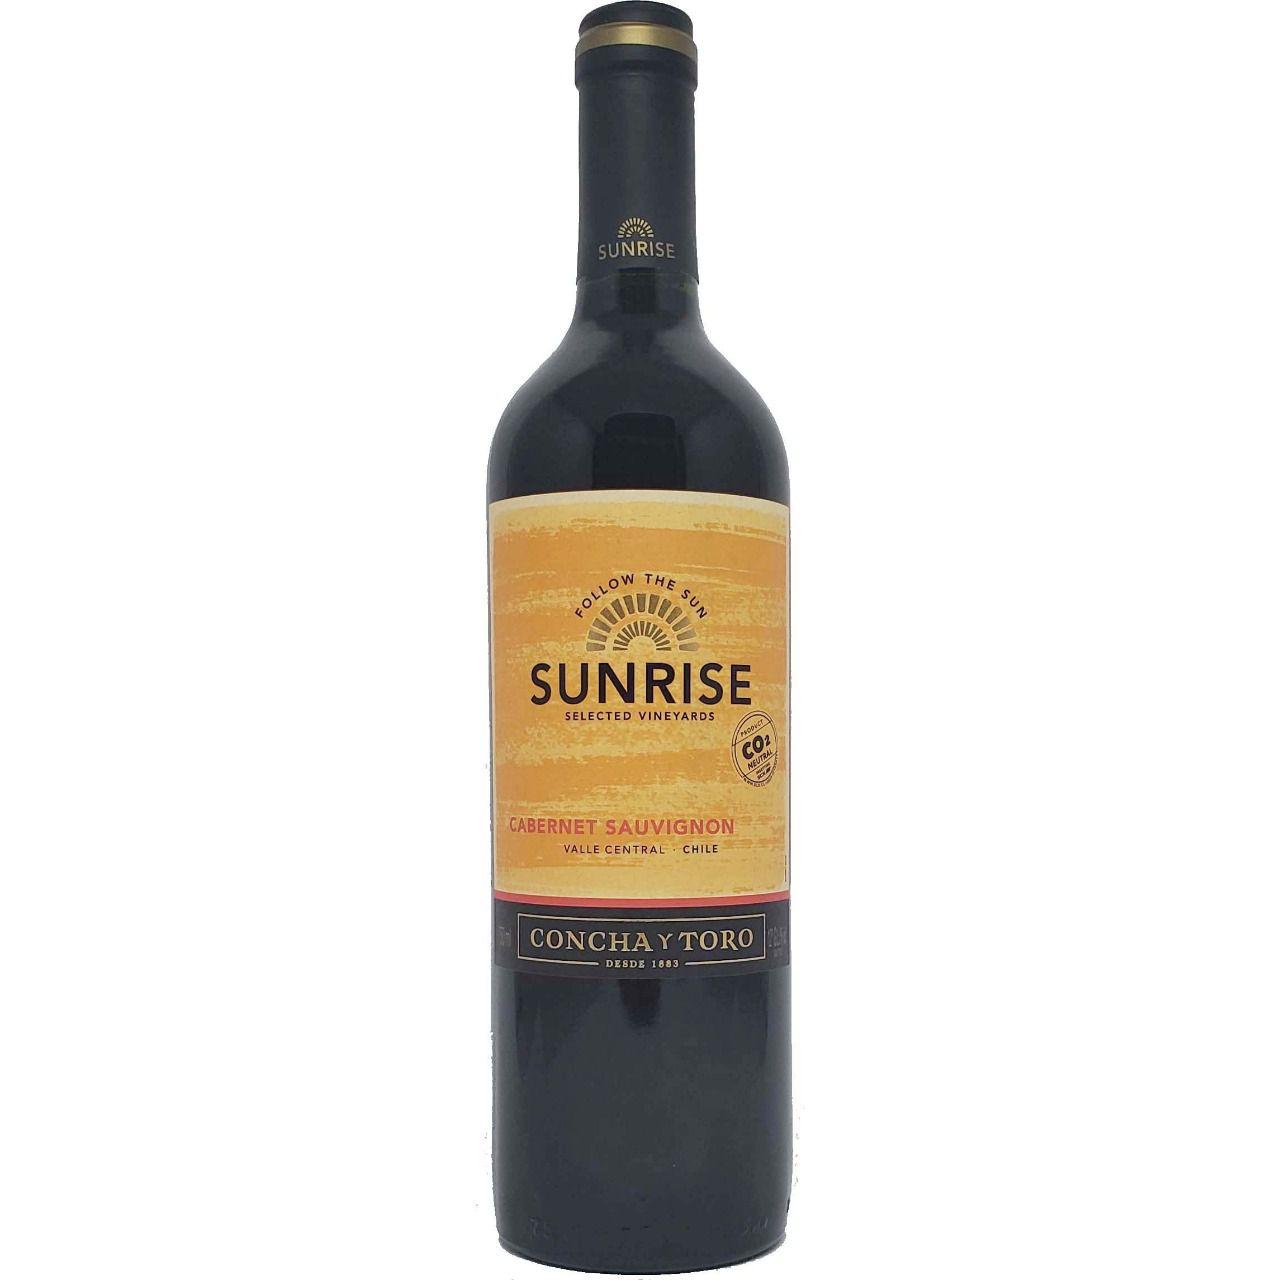 Vinho Tinto Sunrise Selected Vineyards Concha y Toro Cabernet Sauvignon  - 750ml -